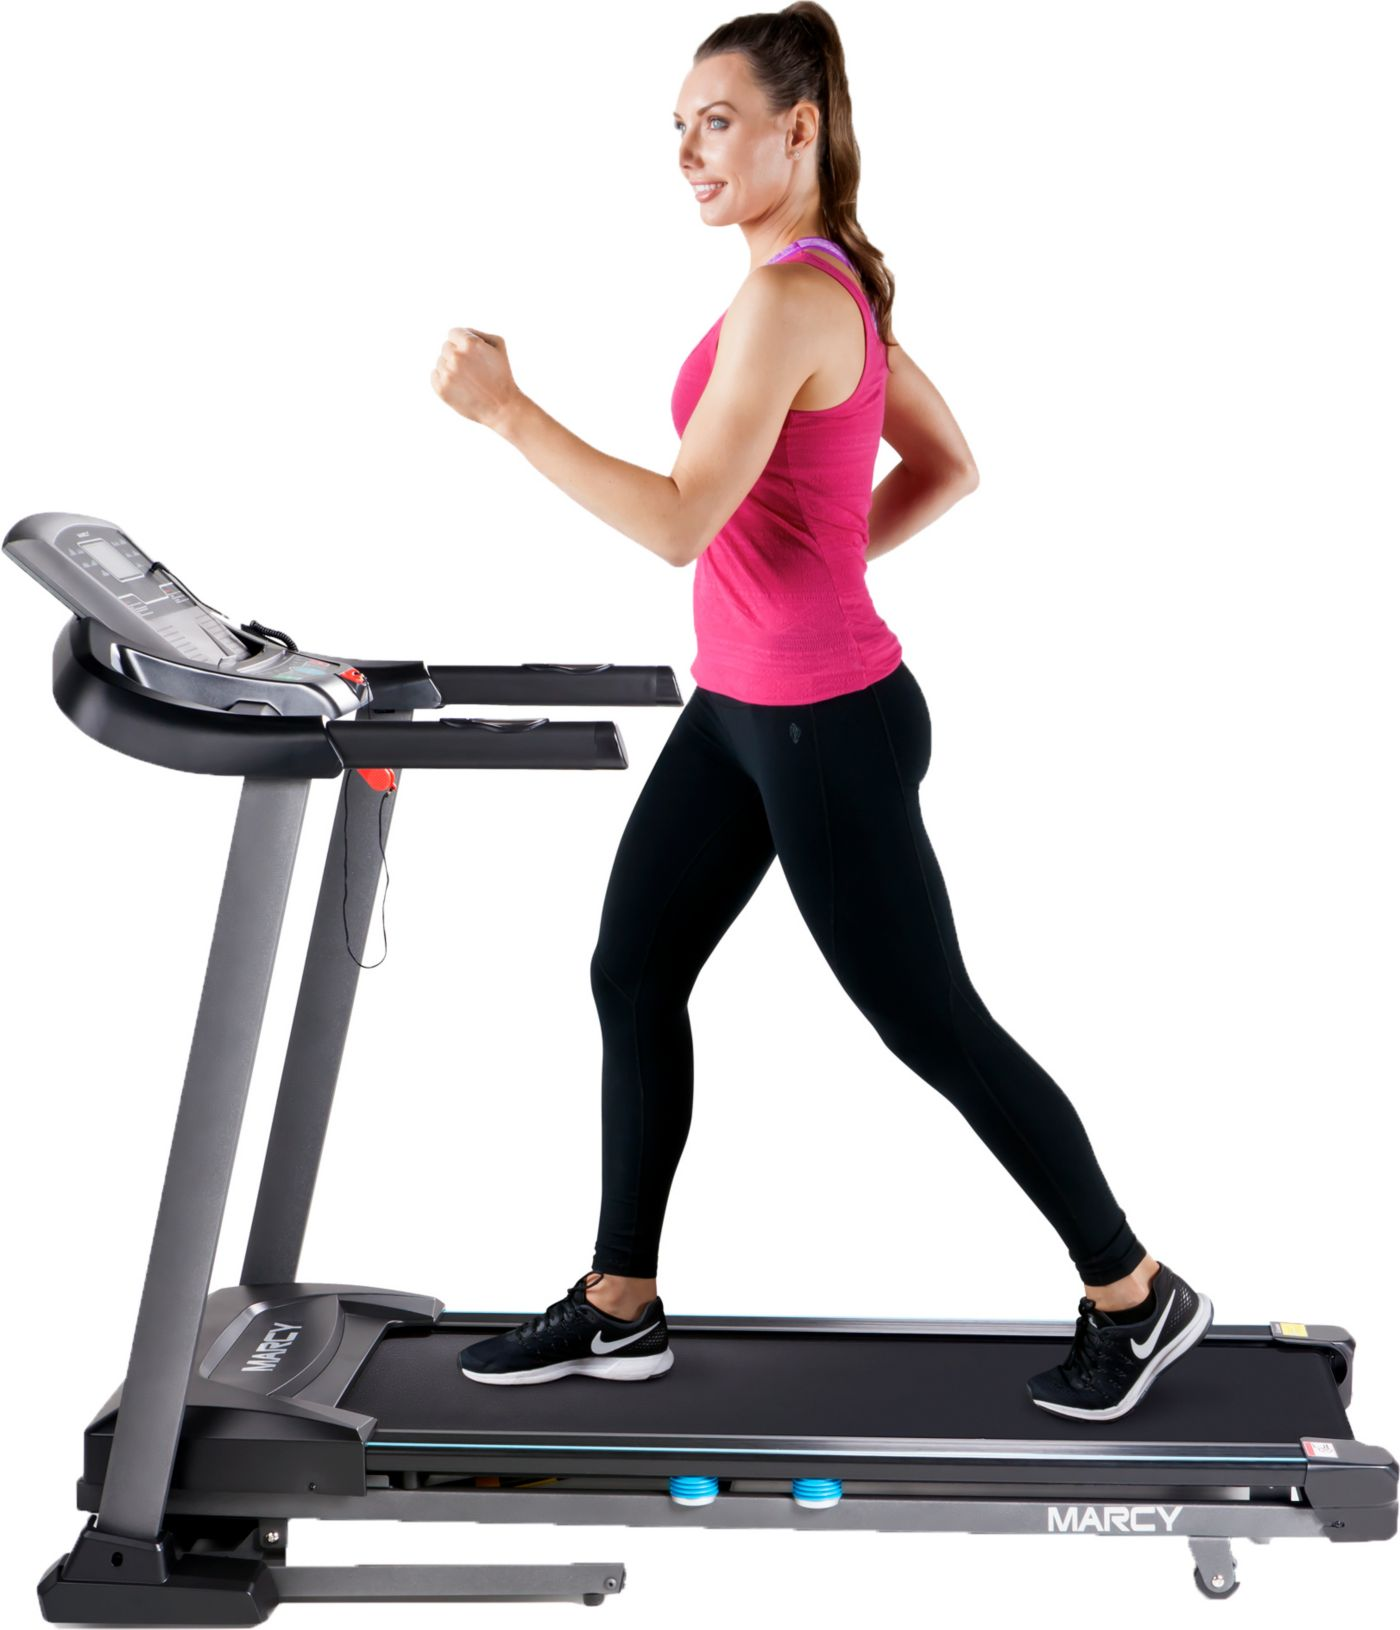 Marcy JX-663SW Motorized Treadmill with Auto Incline